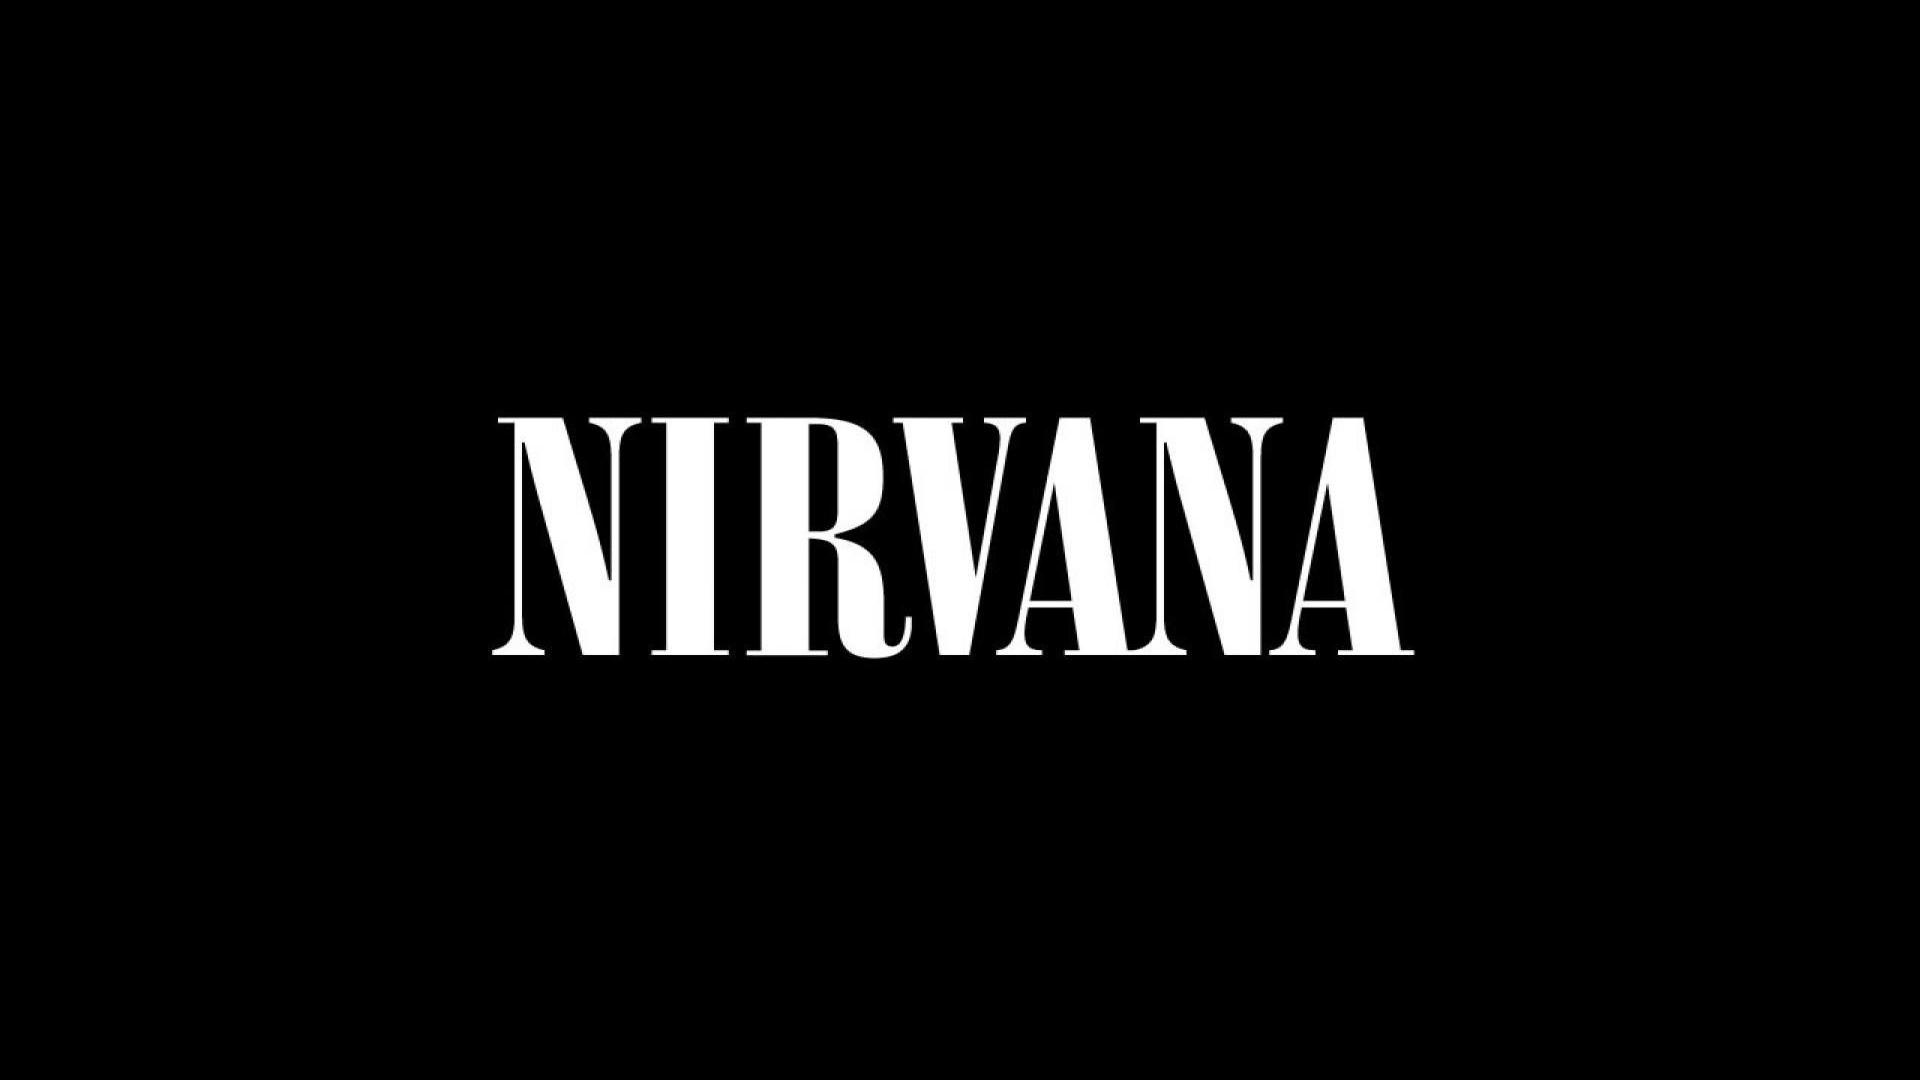 Nirvana Letters Logo Font Background 1920x1080